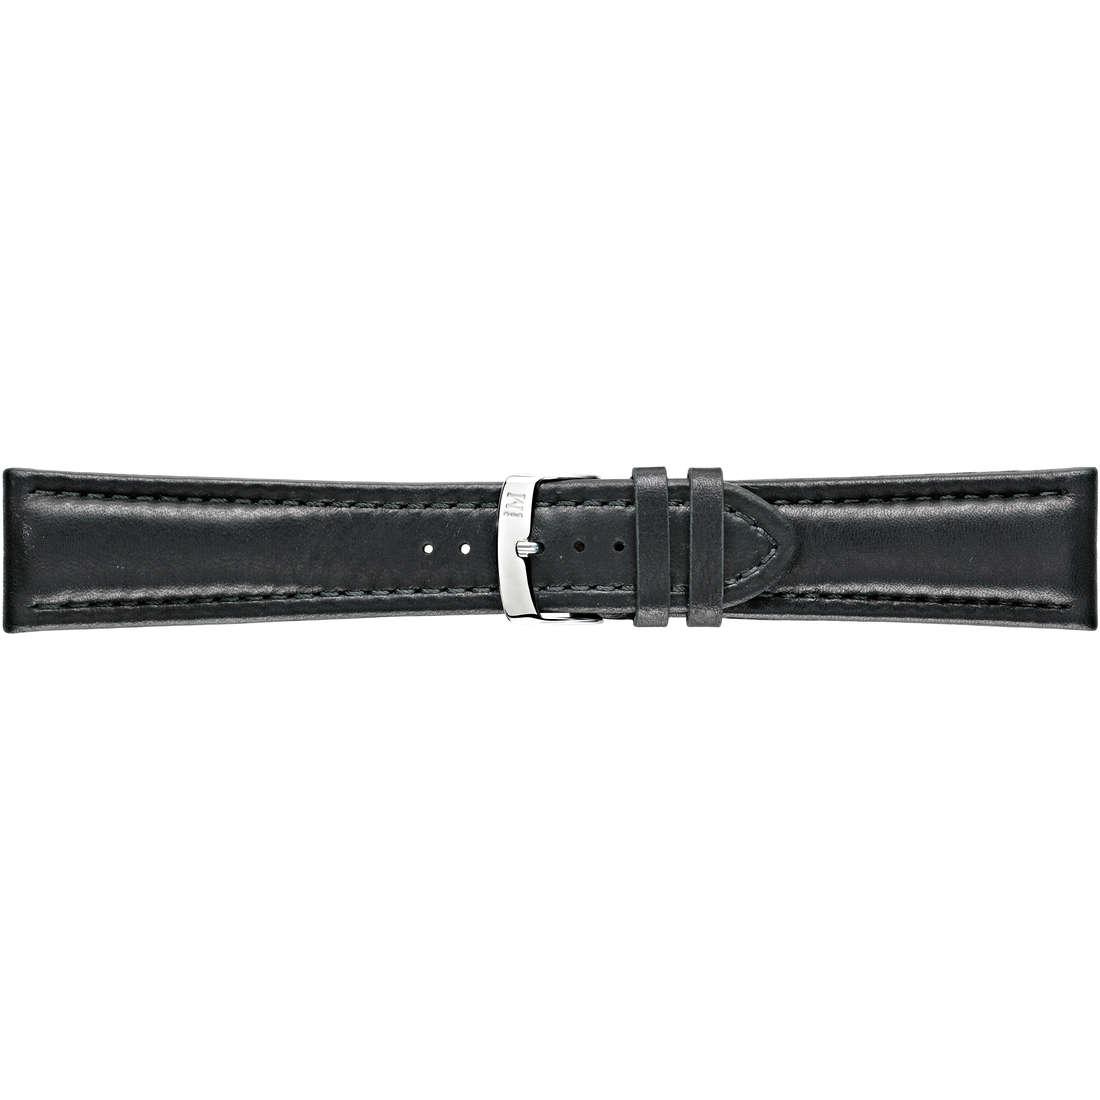 watch watch bands watch straps man Morellato Morellato 1930 A01U4026A37019CR24